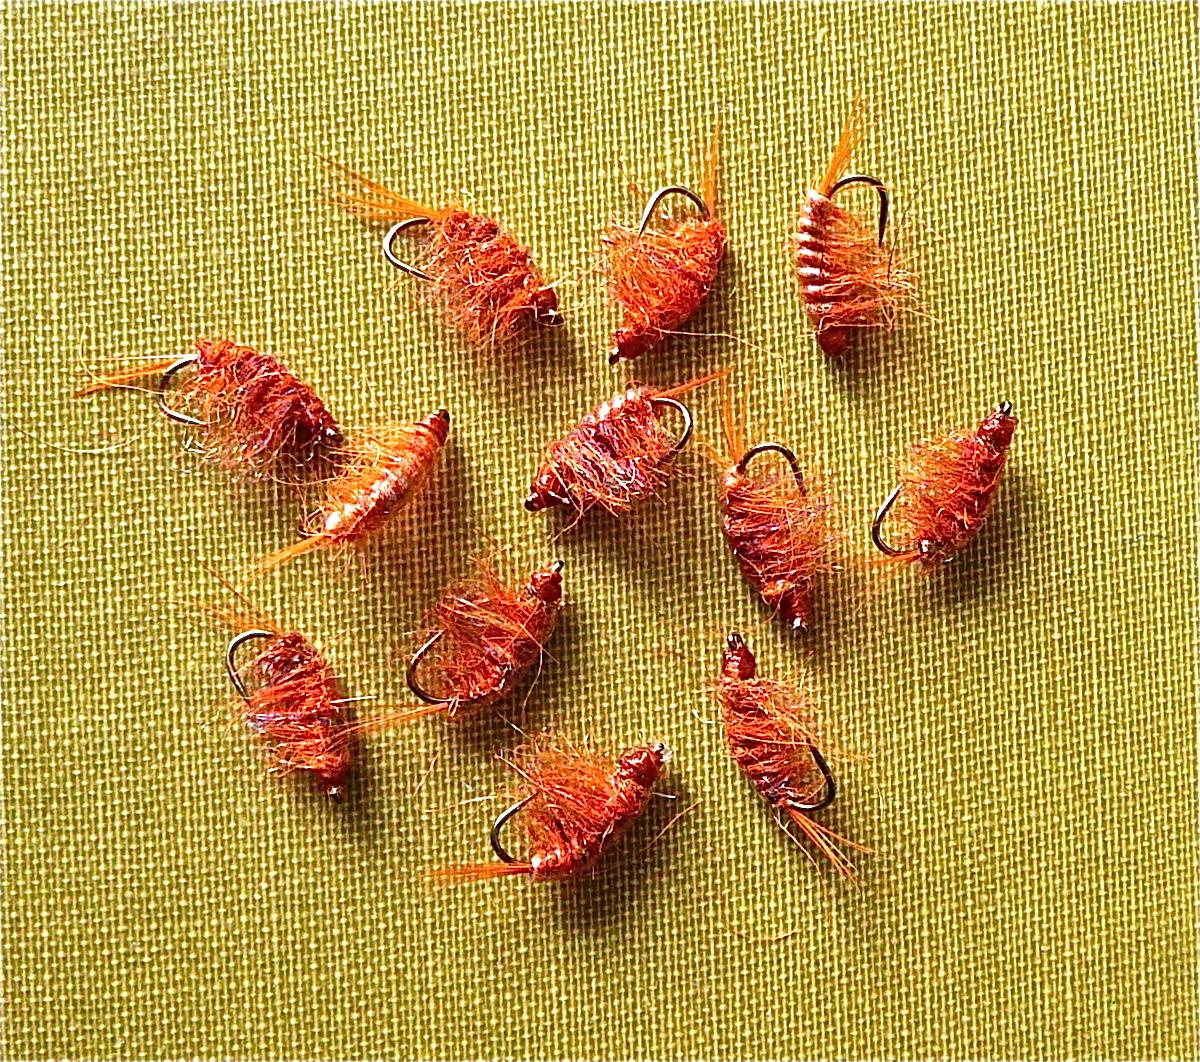 "Micro Thin /"" .5mm /"" Foam Fly Tying Crafts"